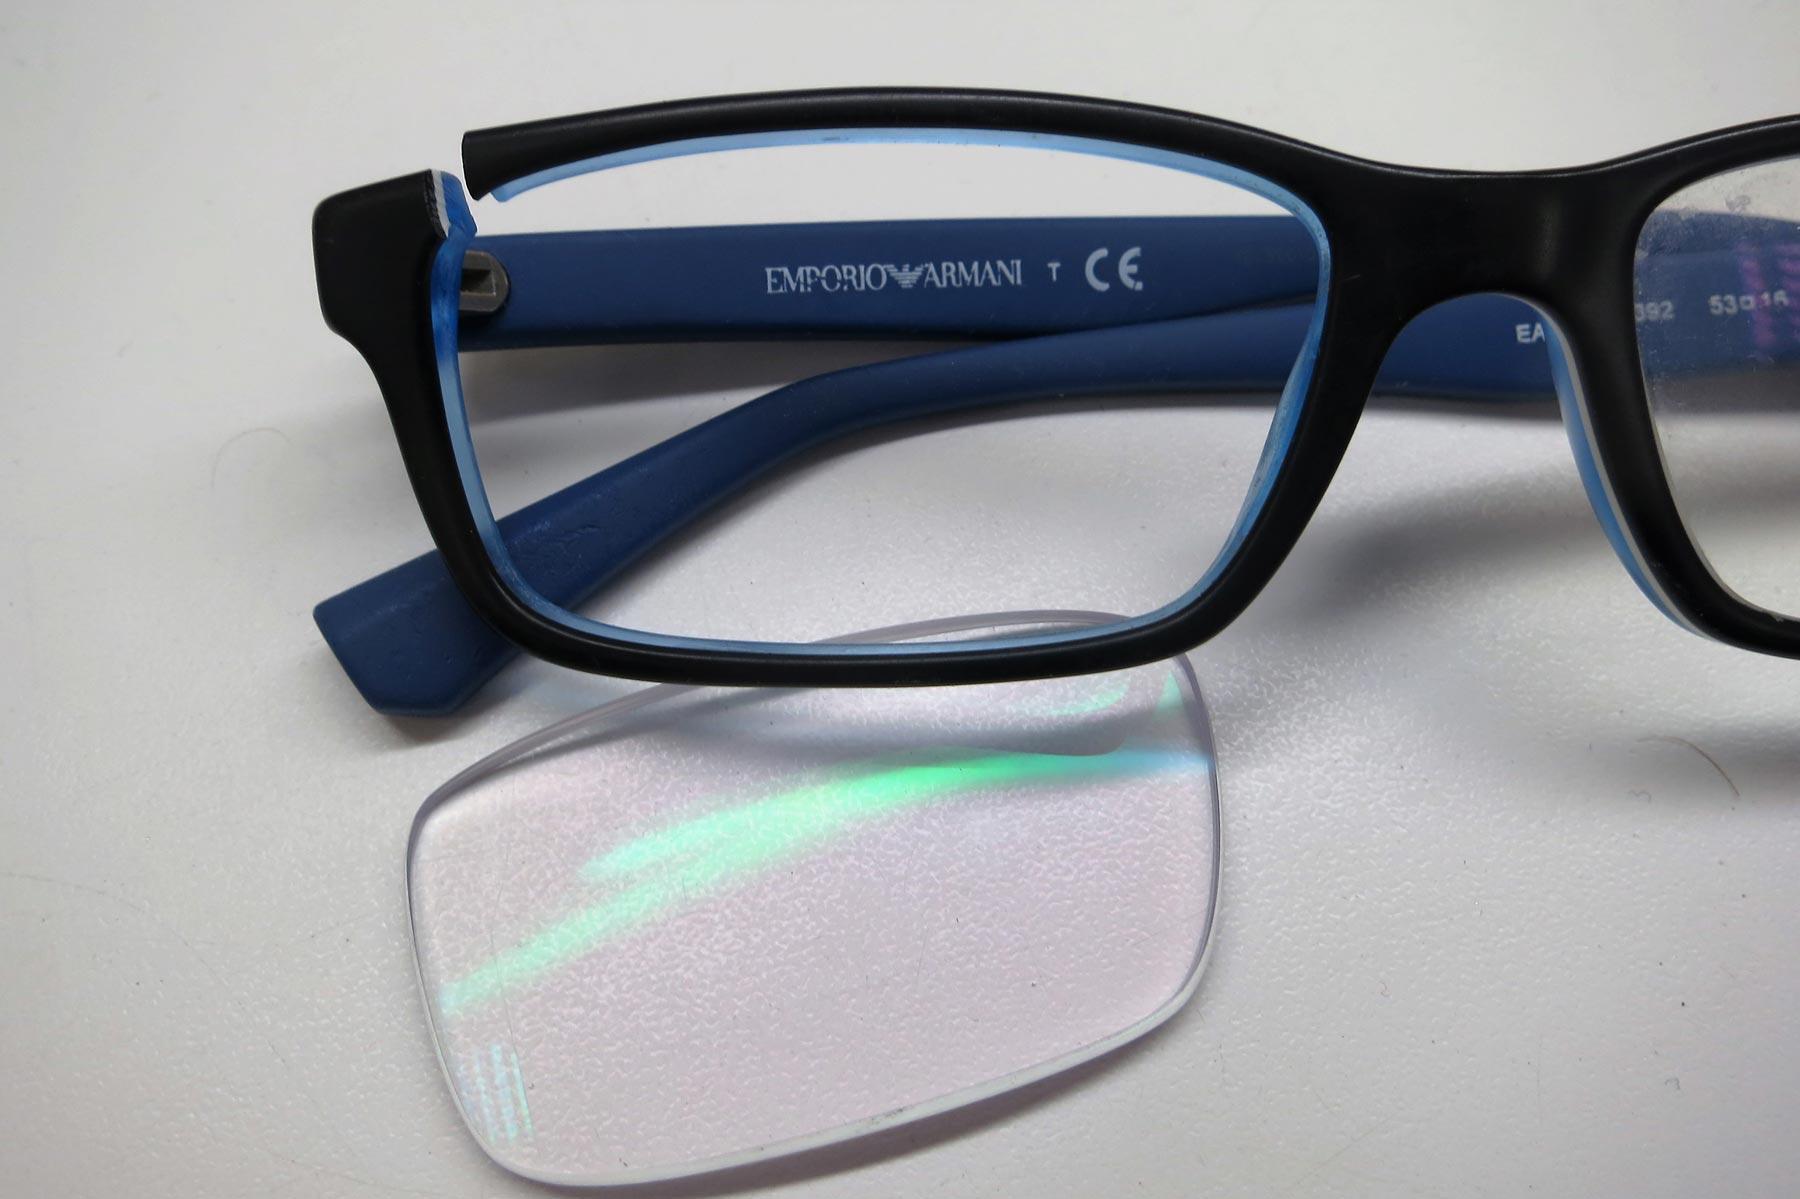 0c9886768a Πάστινος σκελετός γυαλιών - Οι πιο συχνές επισκευές